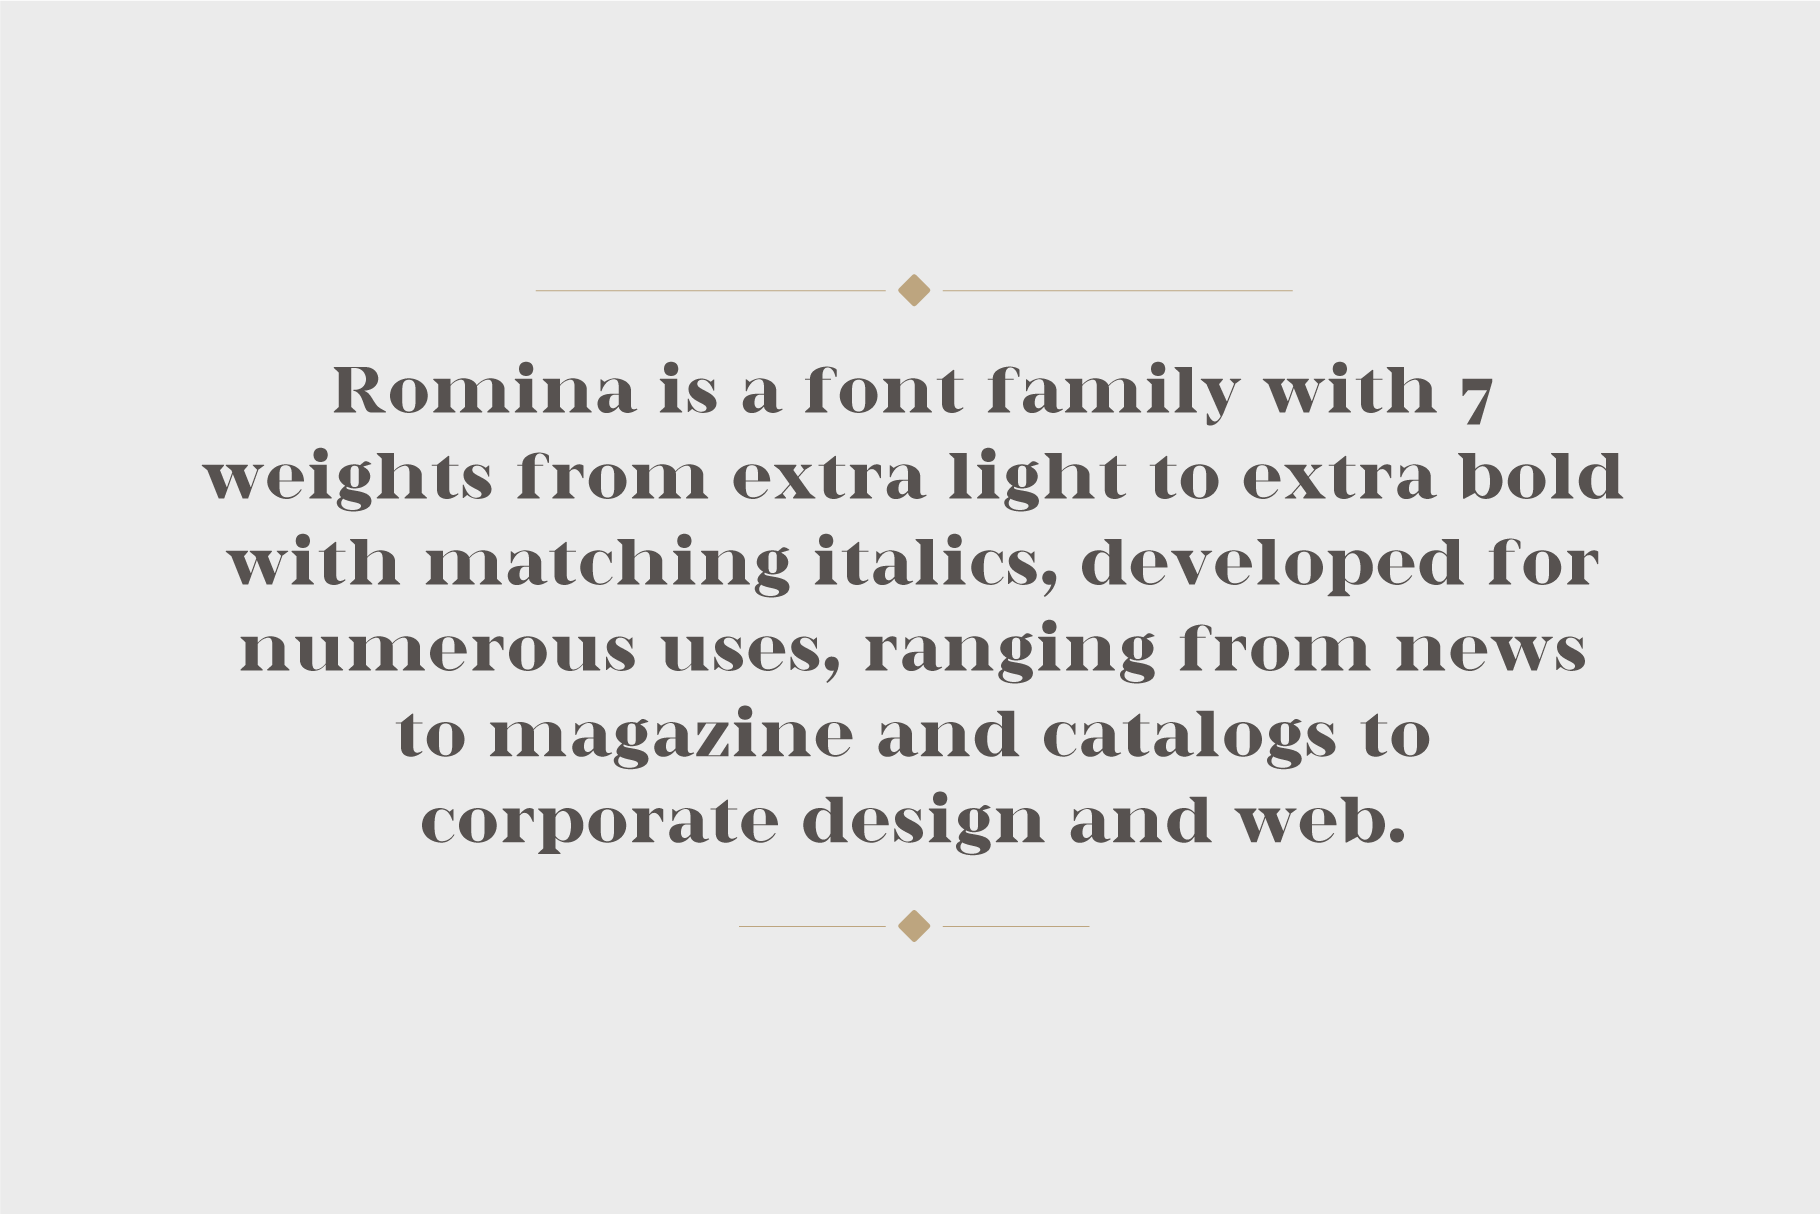 Romina example image 2